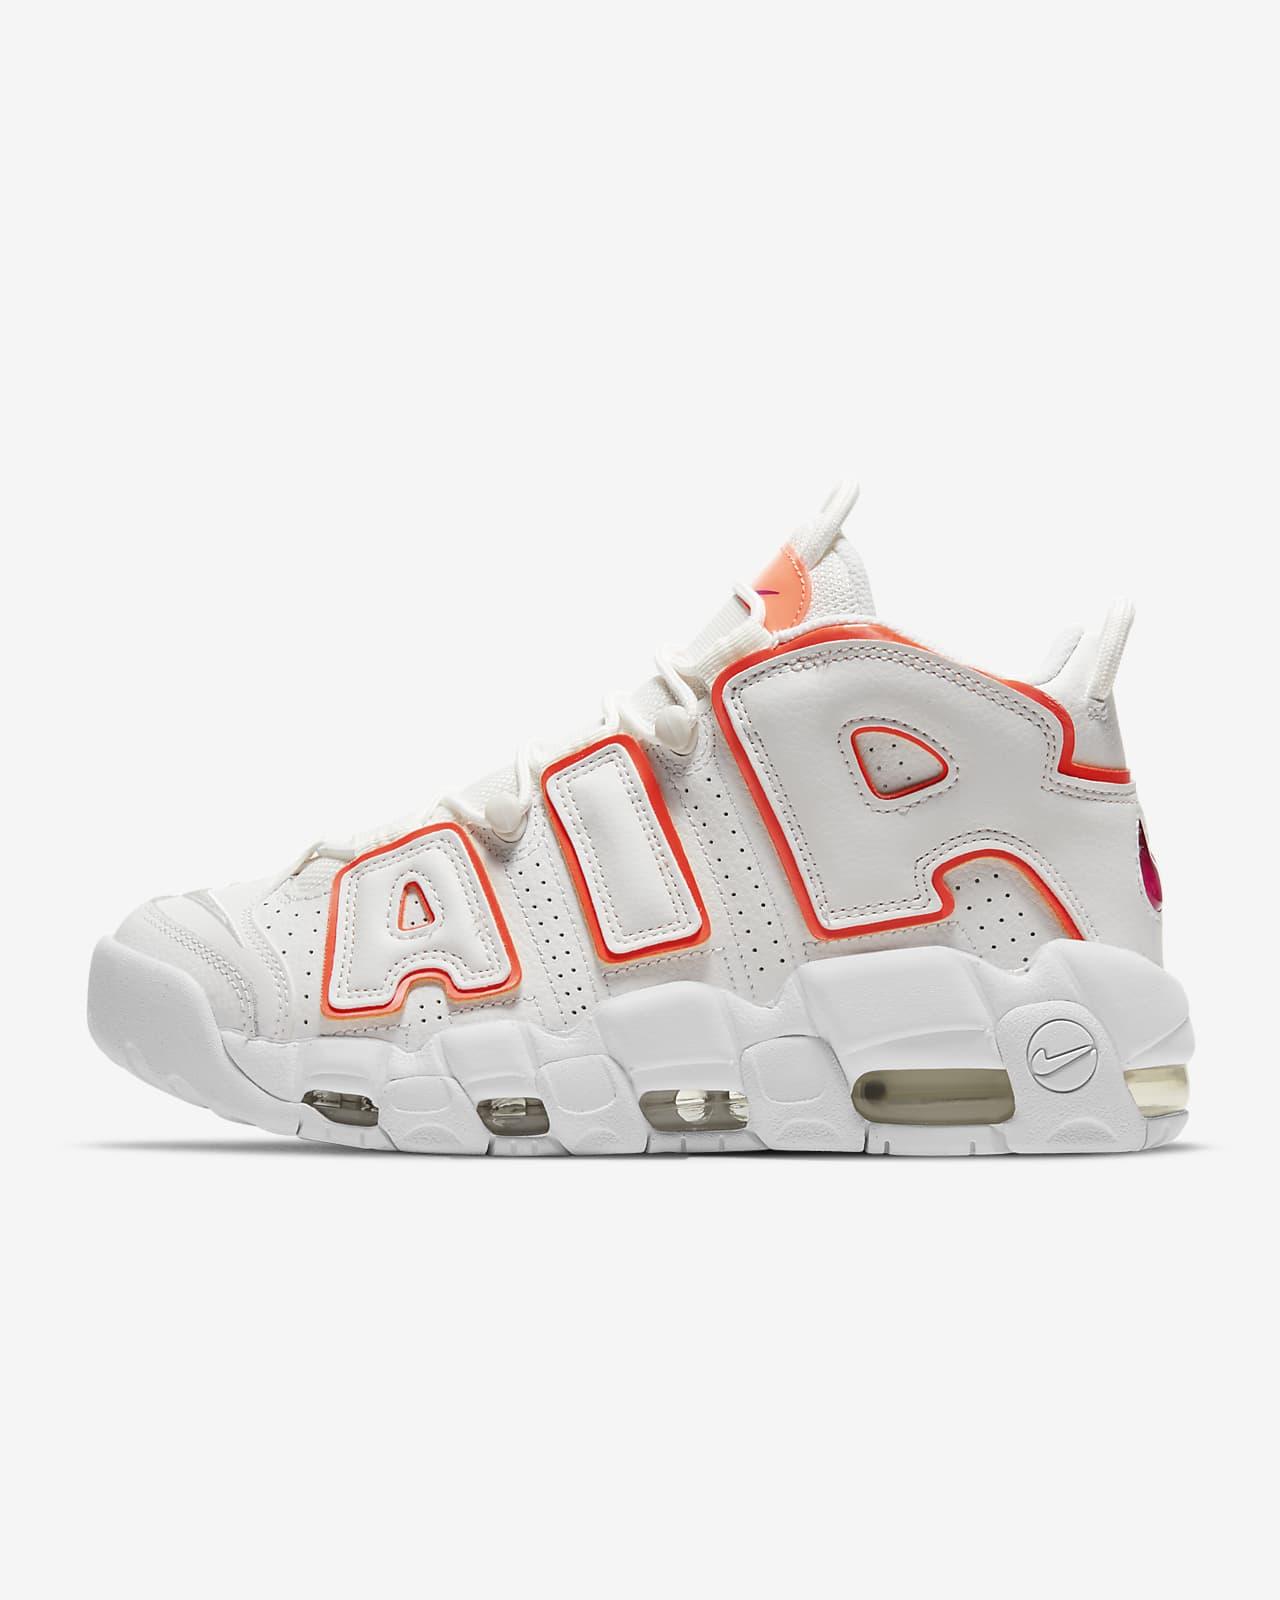 Nike Air More Uptempo Kadın Ayakkabısı